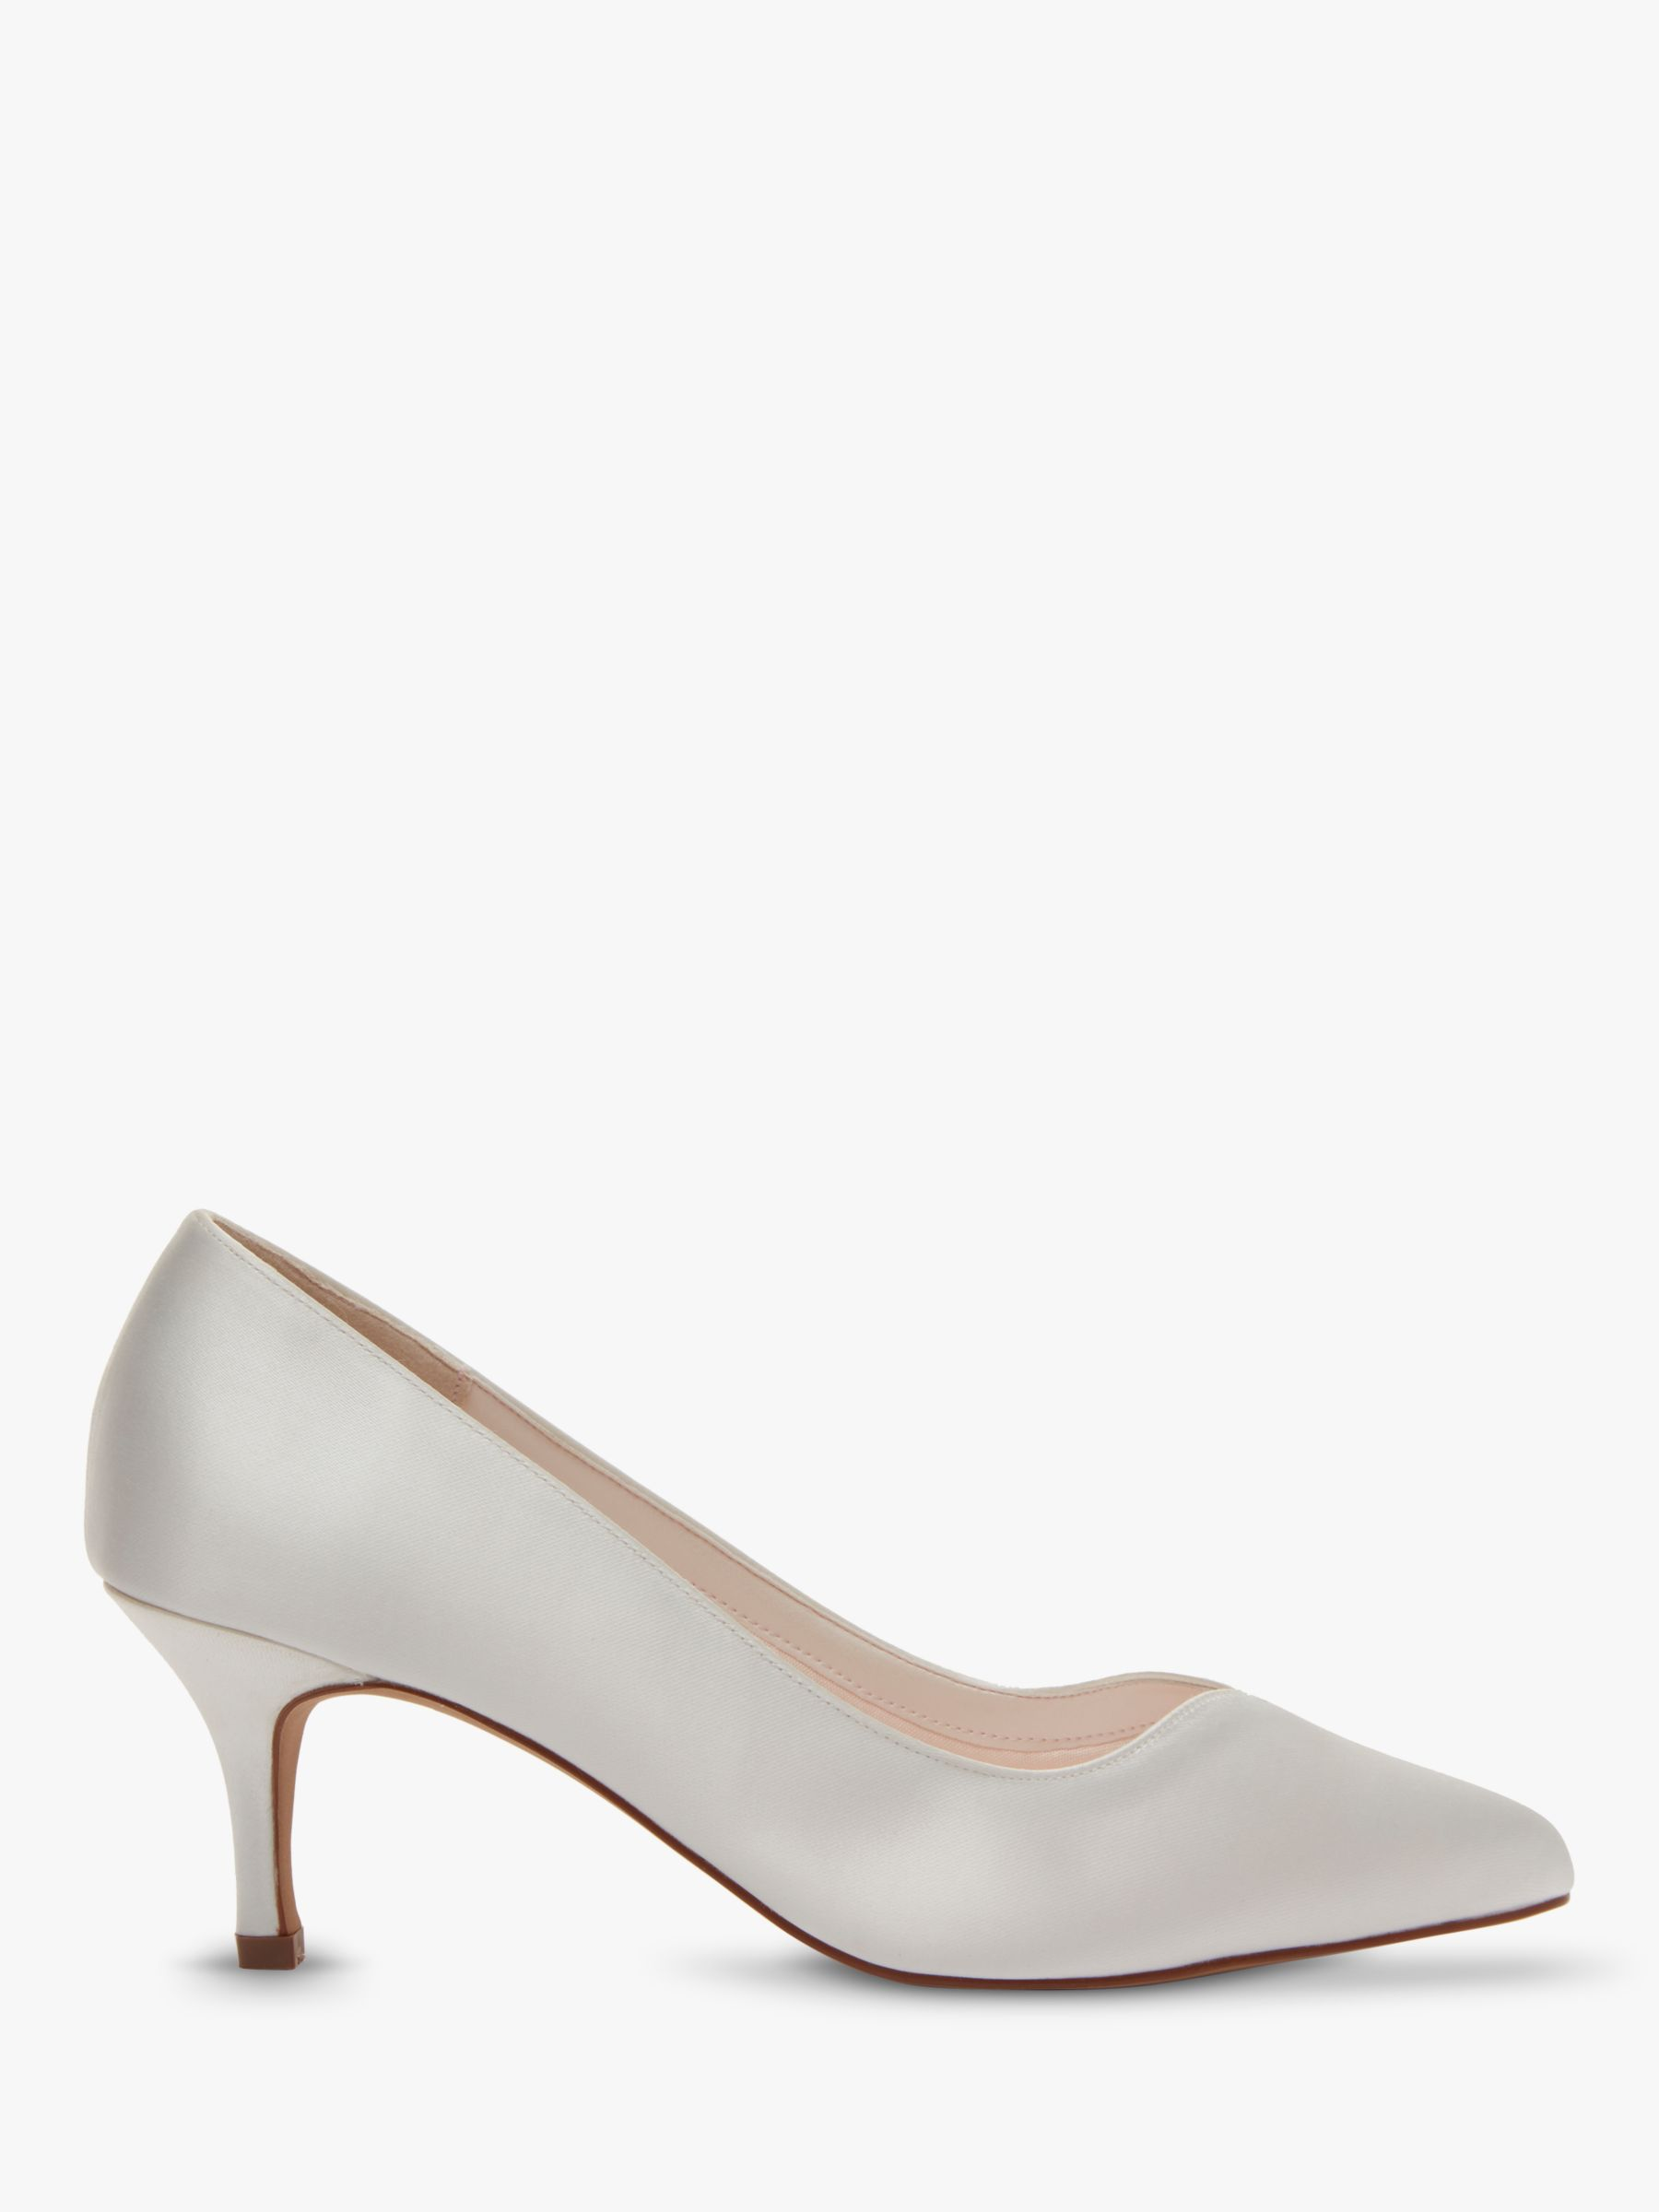 Rainbow Club Rainbow Club Elizabeth Stiletto Heeled Court Shoes, Ivory